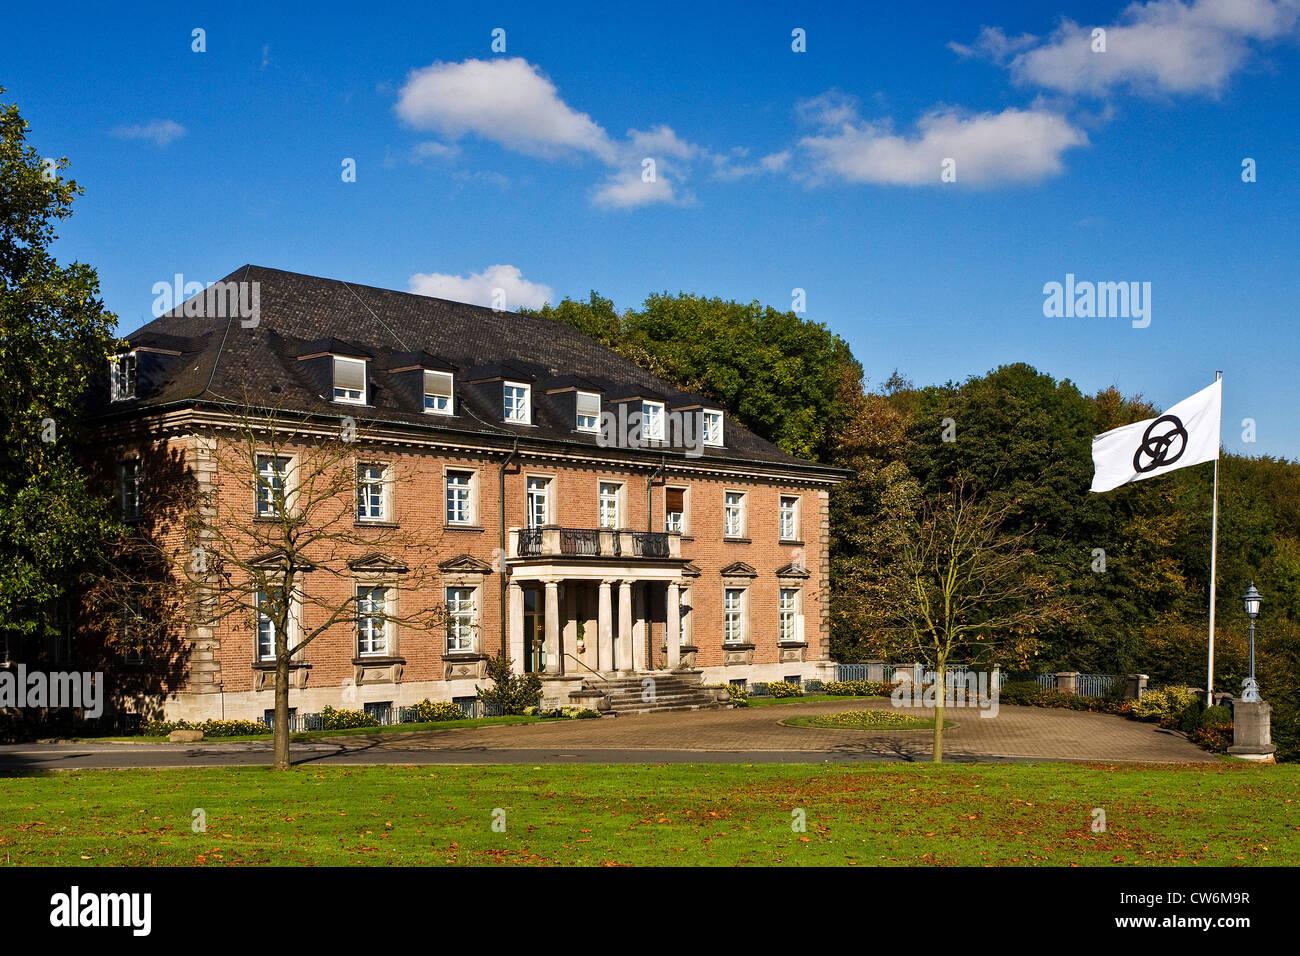 domicile of foundation Alfred Krupp von Bohlen und Halbach on the area of Villa Huegel, Germany, North Rhine-Westphalia, - Stock Image